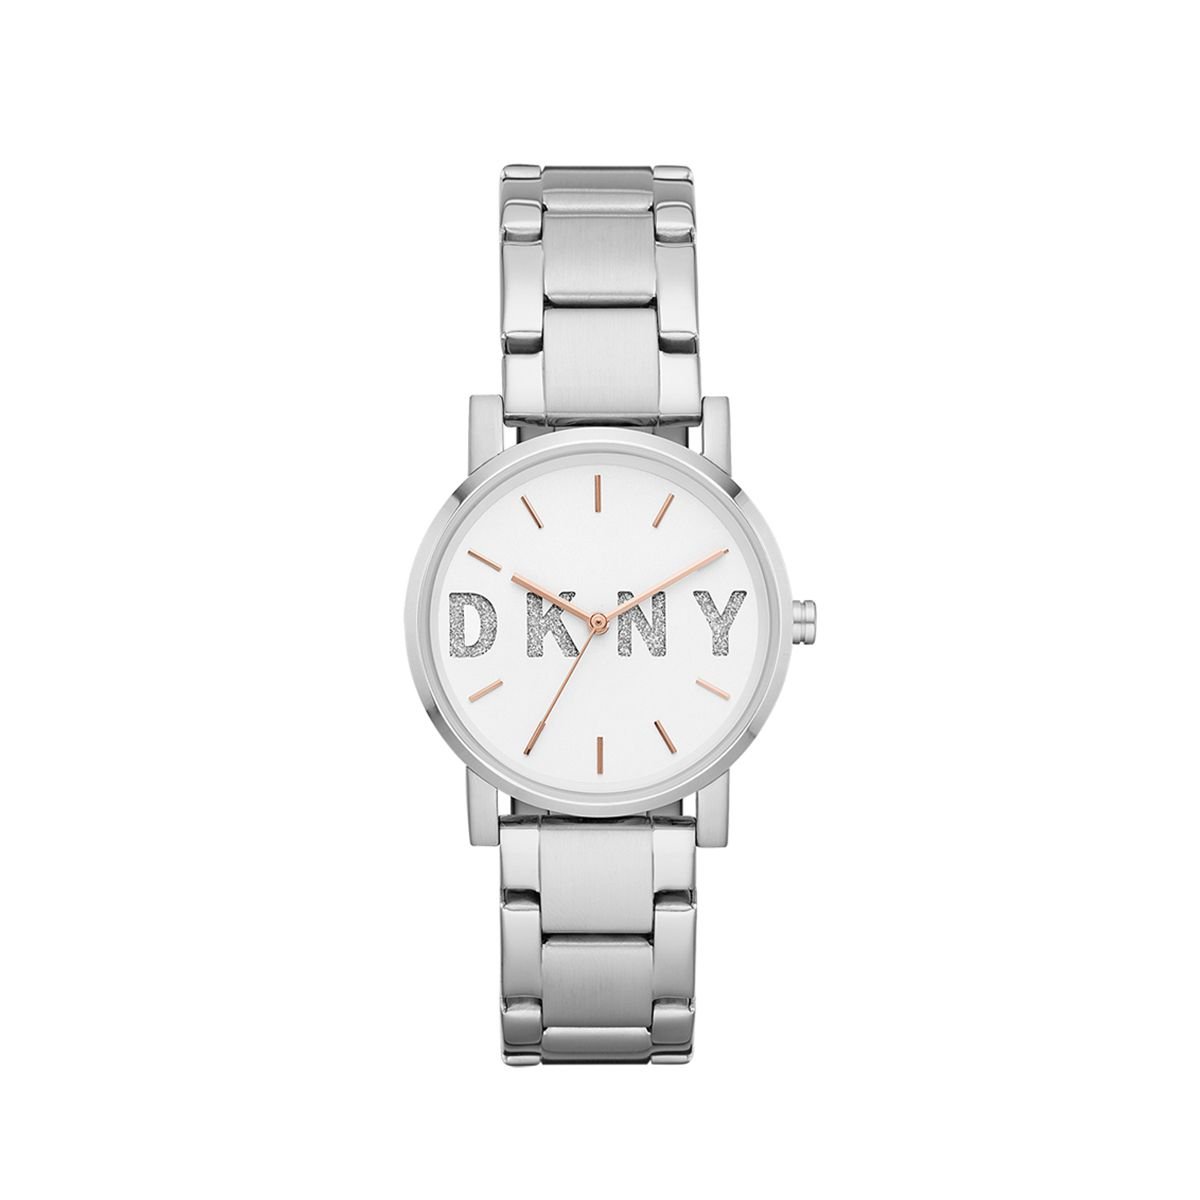 DKNY Dresses & Clothing for Women - Macy's